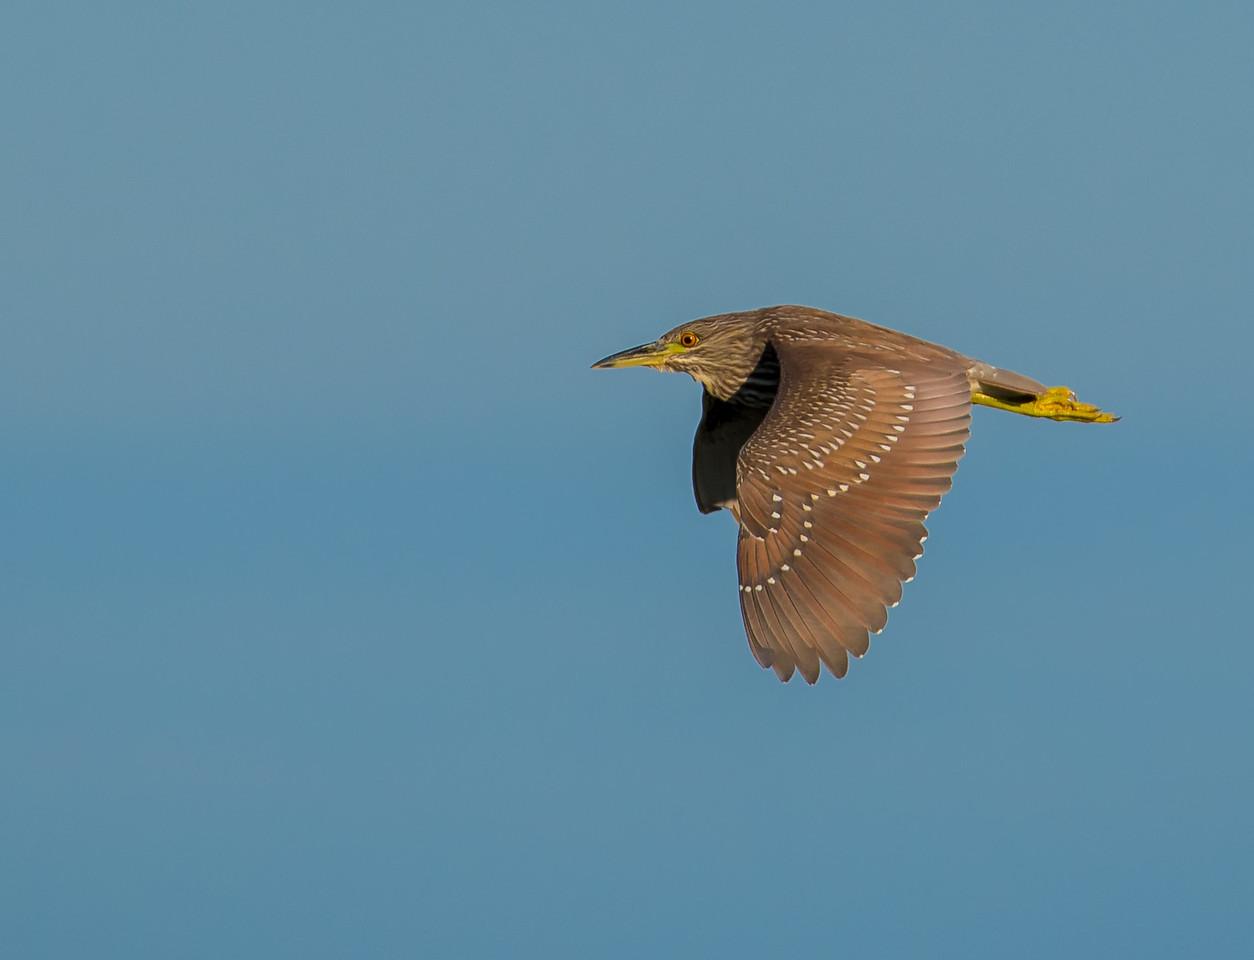 Immature Black-crown Night Heron in flight